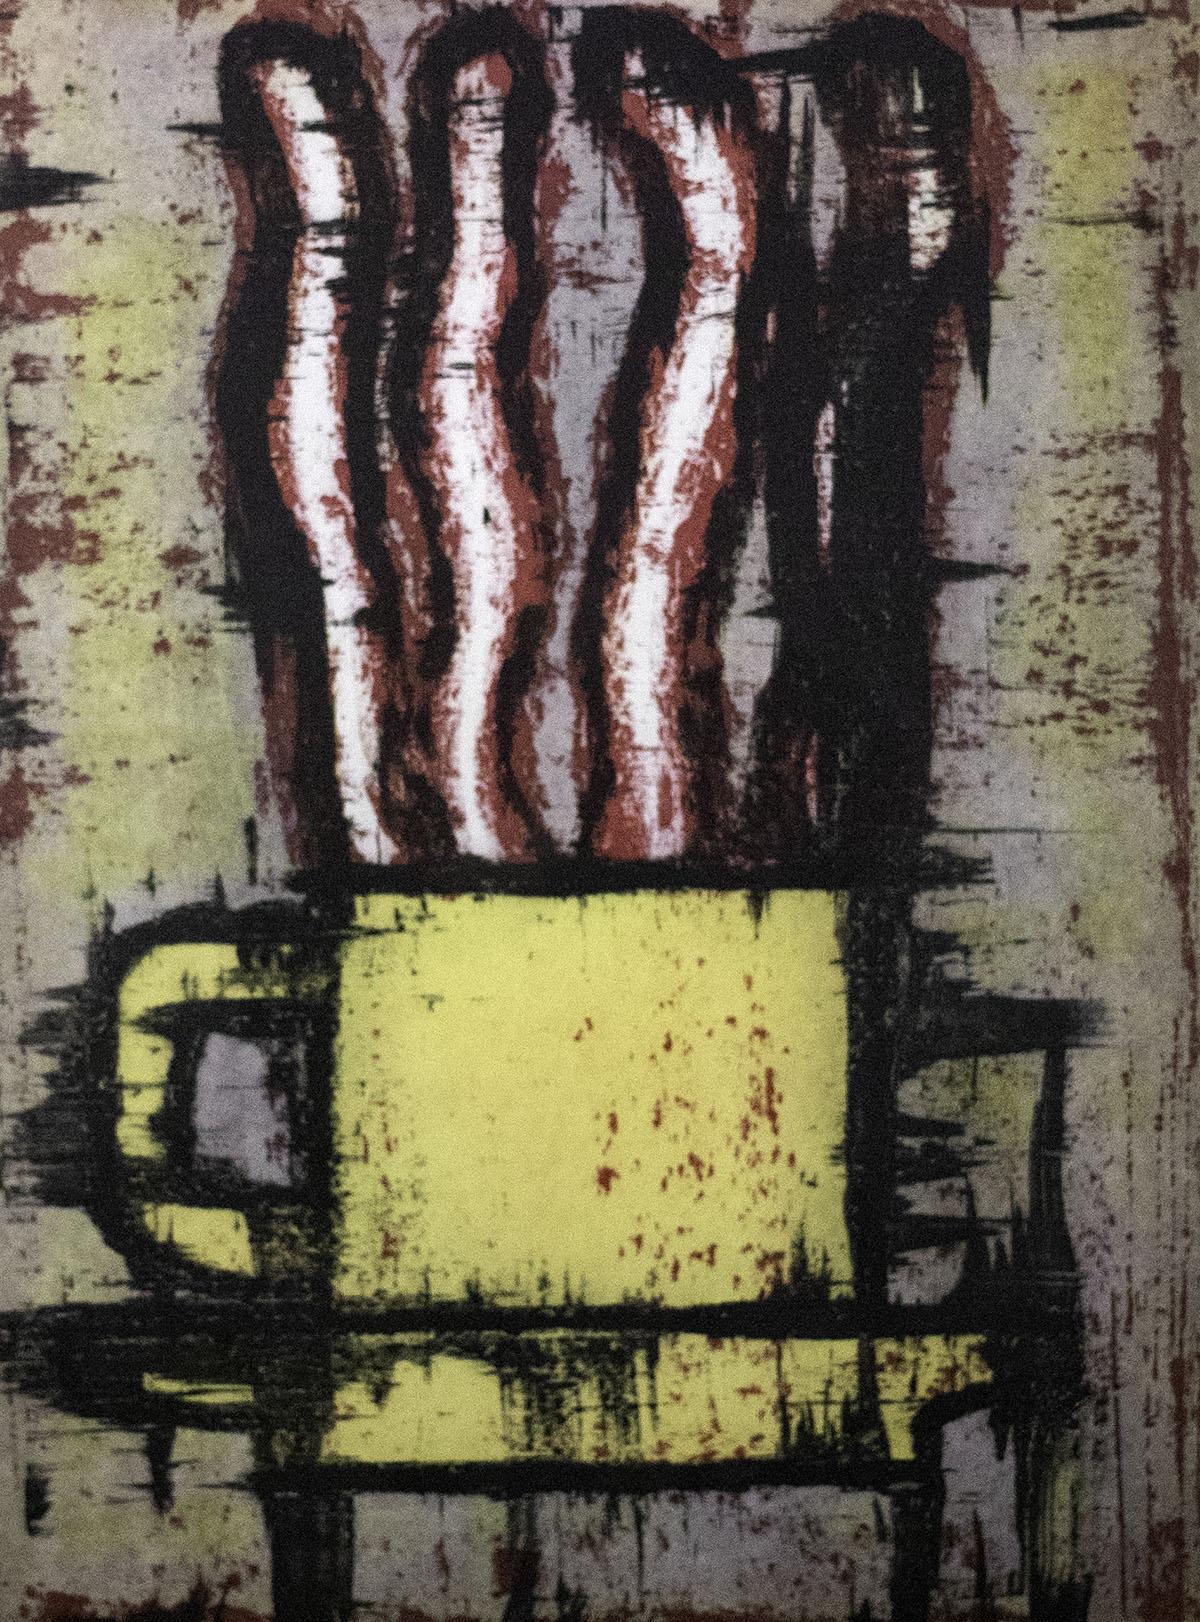 Aaron Fink, Coffee Cup, 1986